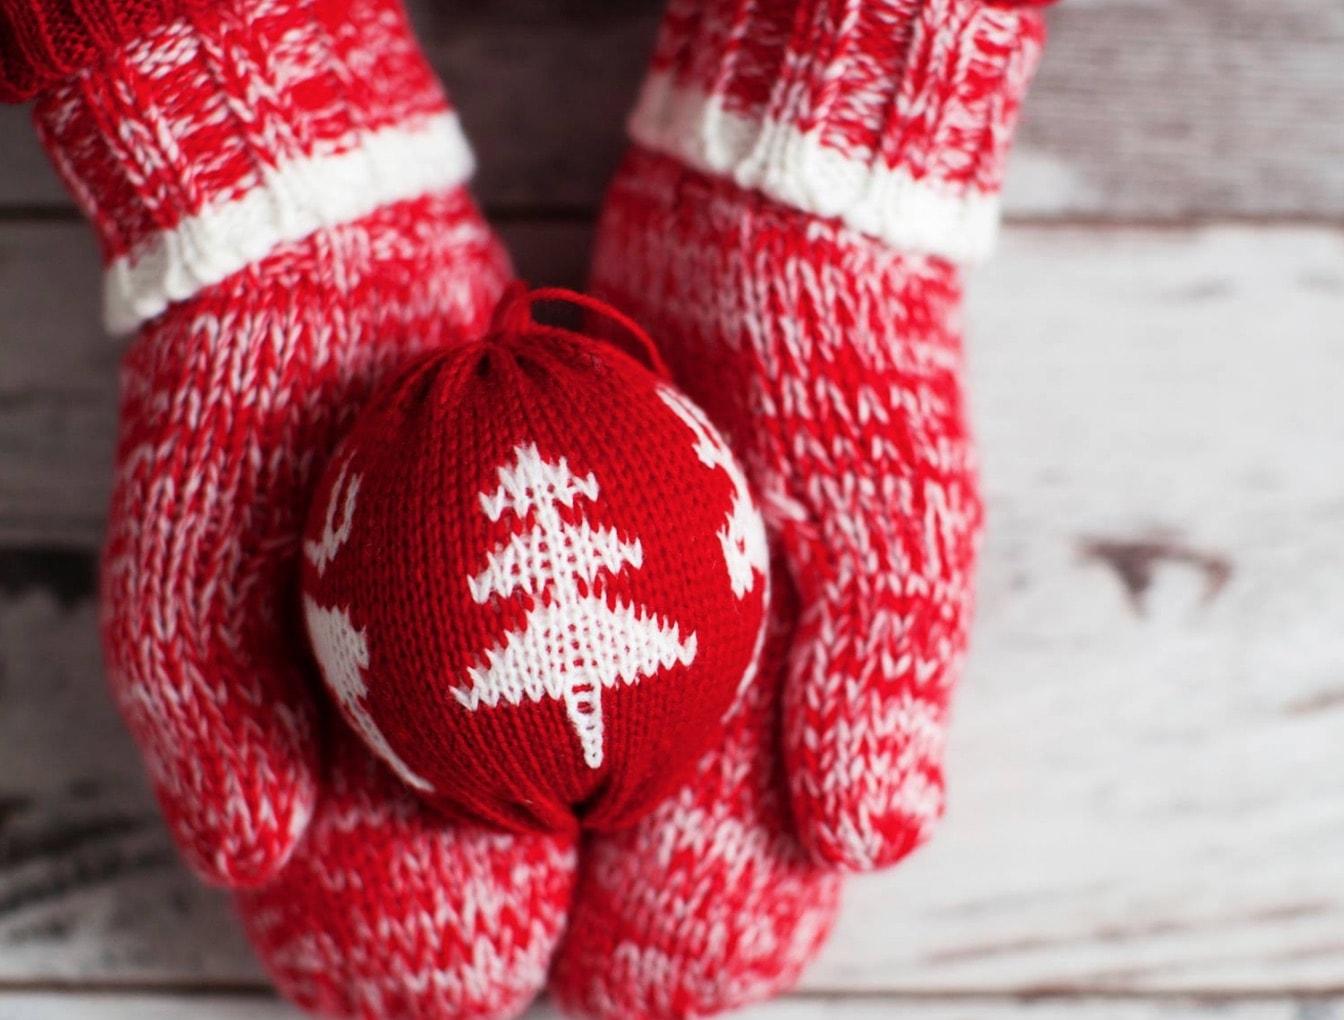 Bearspaw Fall & Christmas Market/Facebook